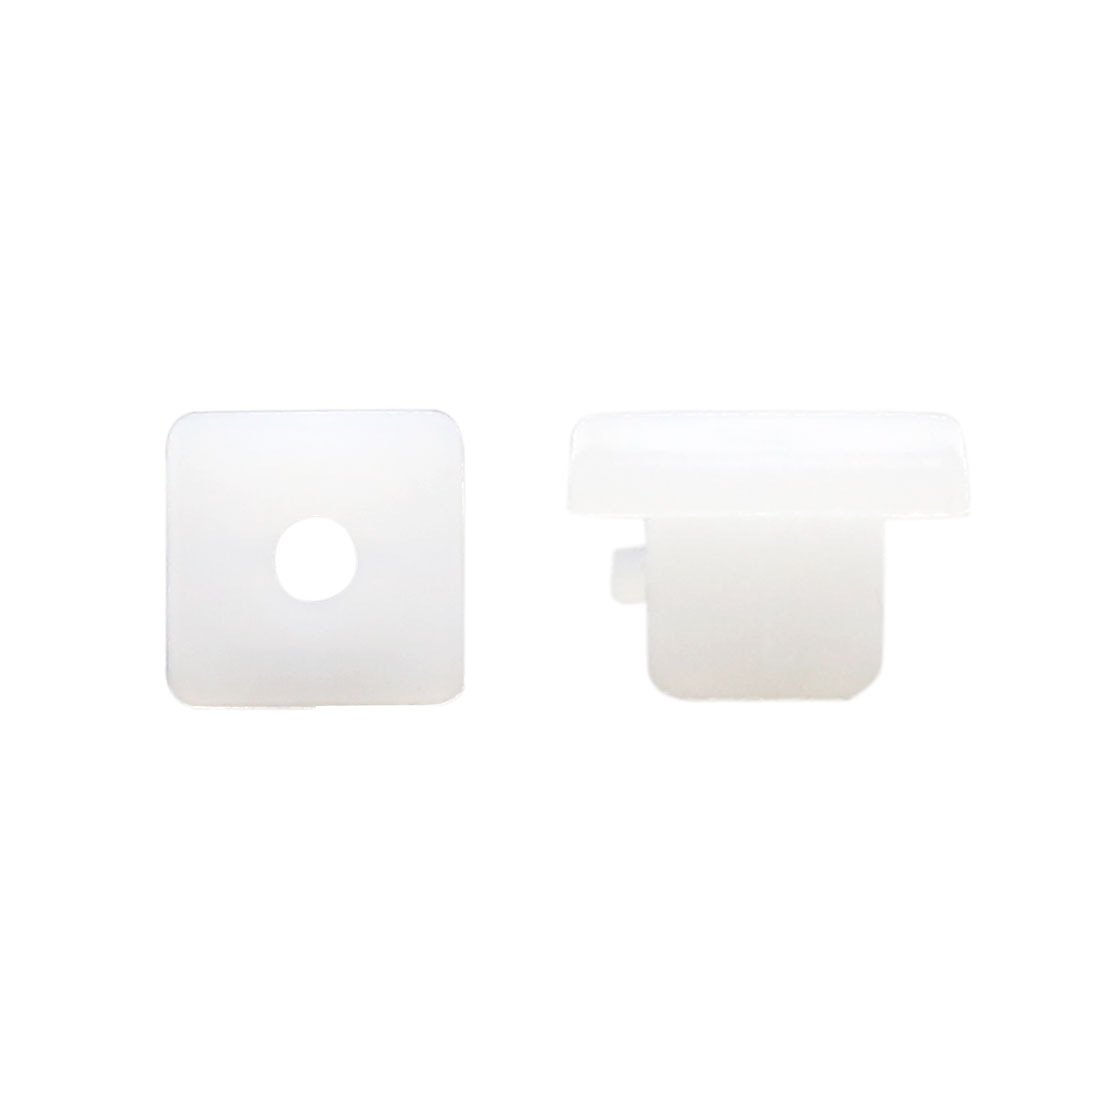 100 Pcs 9mm x 9mm Hole White Plastic Rivet Trim Fastener for Car